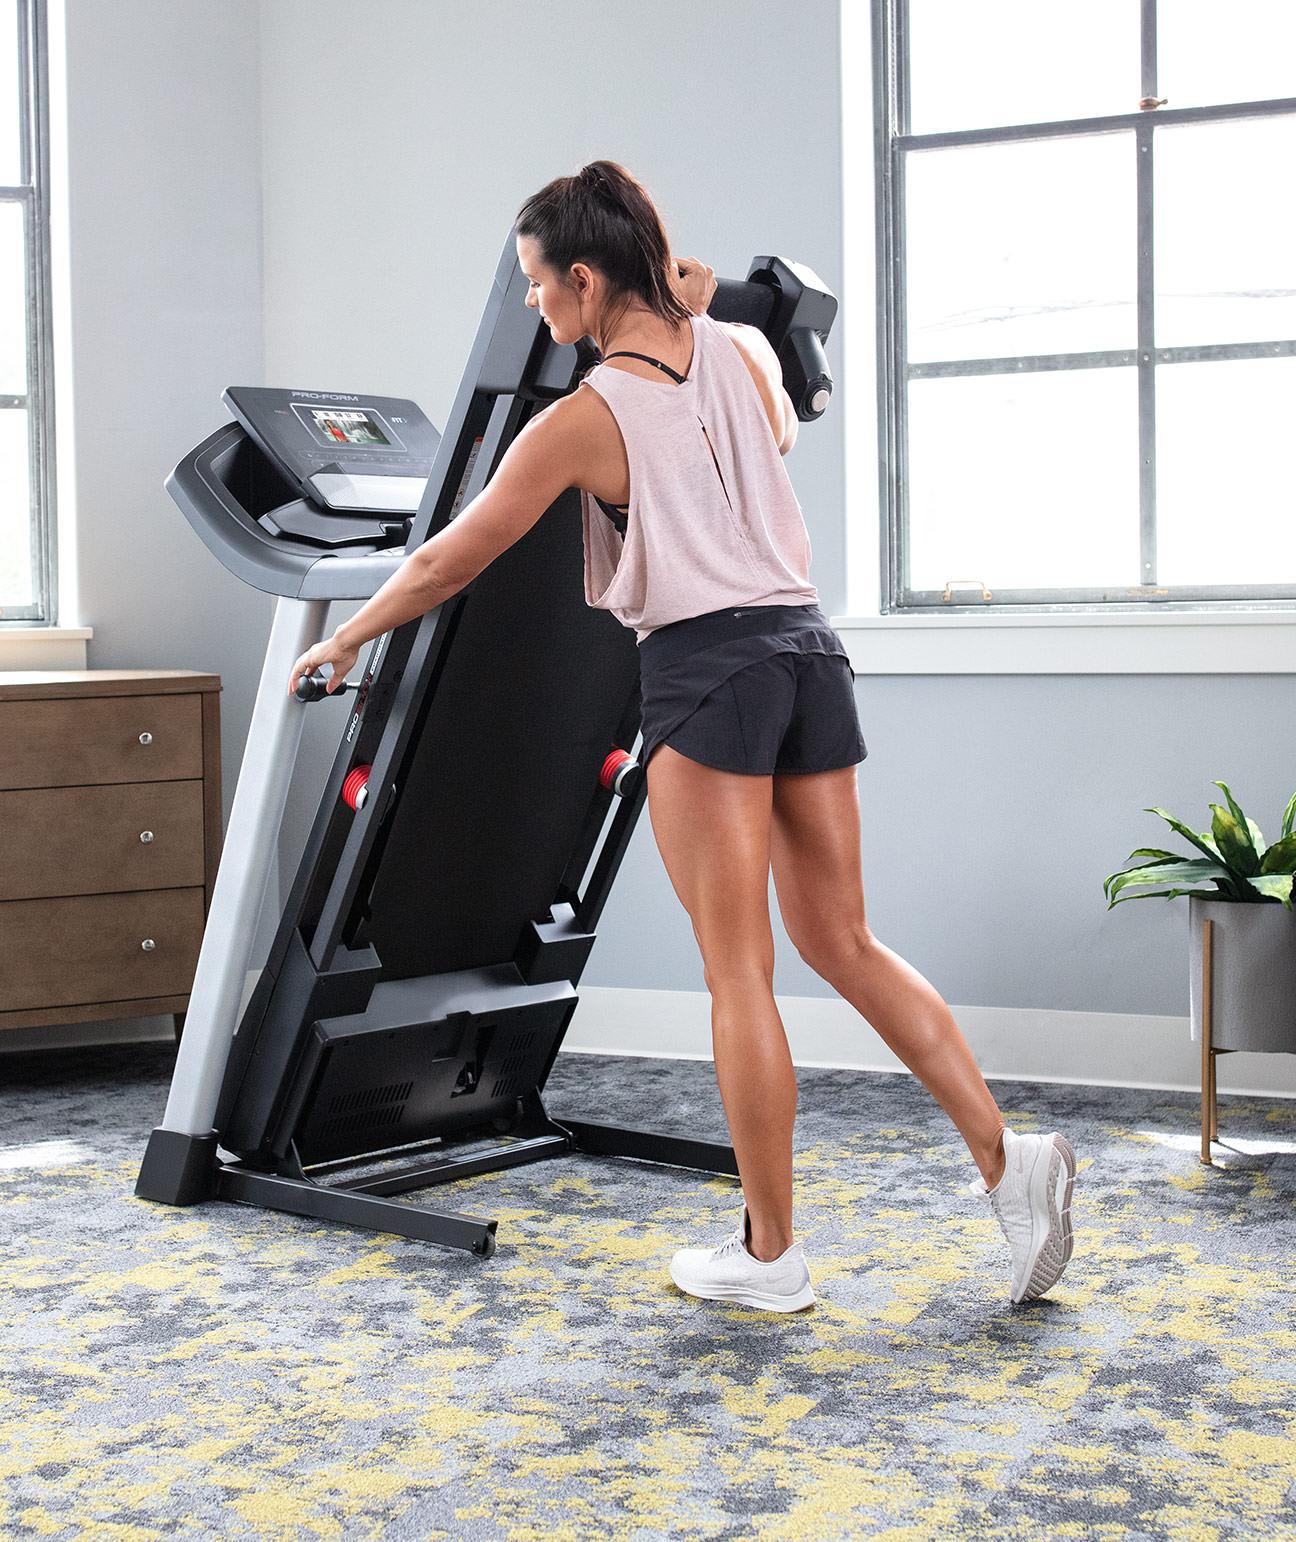 woman folding the treadmill